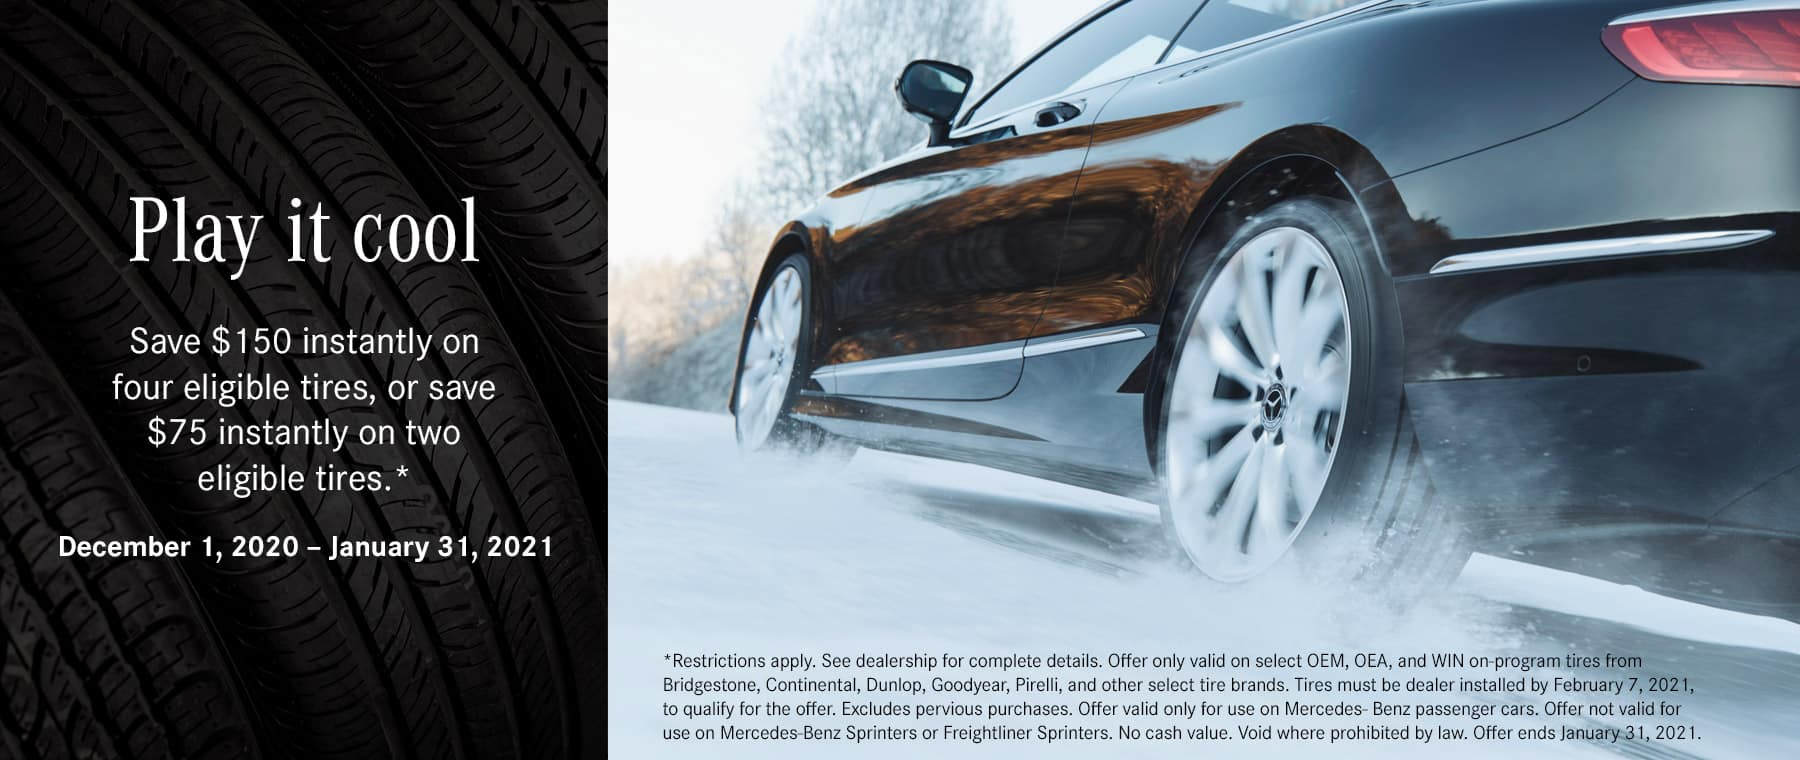 Homepage-Slider-MBH-Tire-Savings-Play-It-Cool